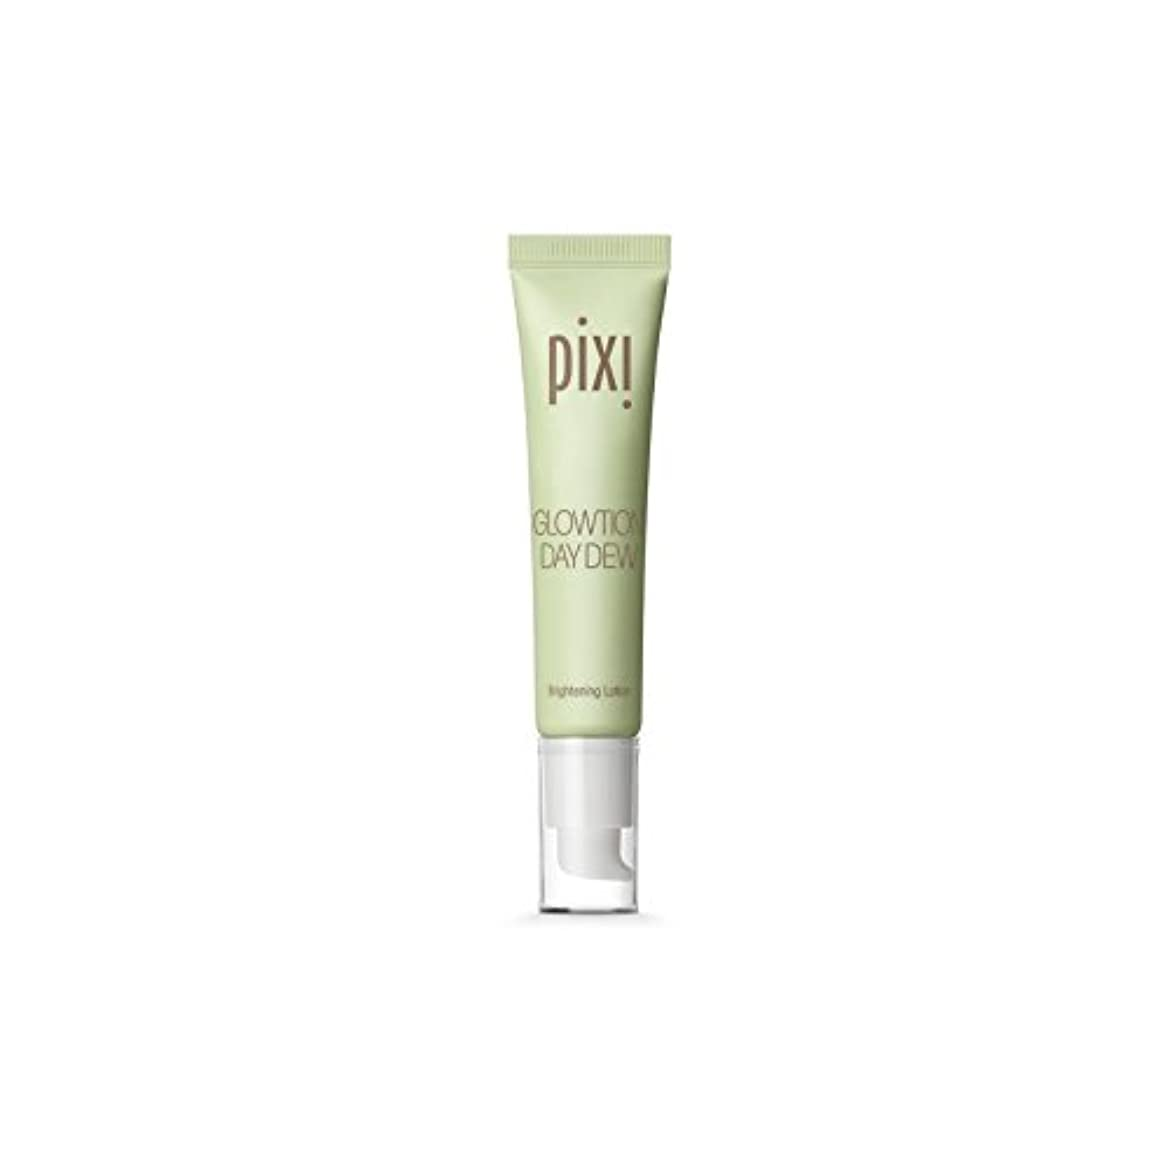 会計地域の読者日露 x4 - Pixi Pixi Glowtion Day Dew (Pack of 4) [並行輸入品]